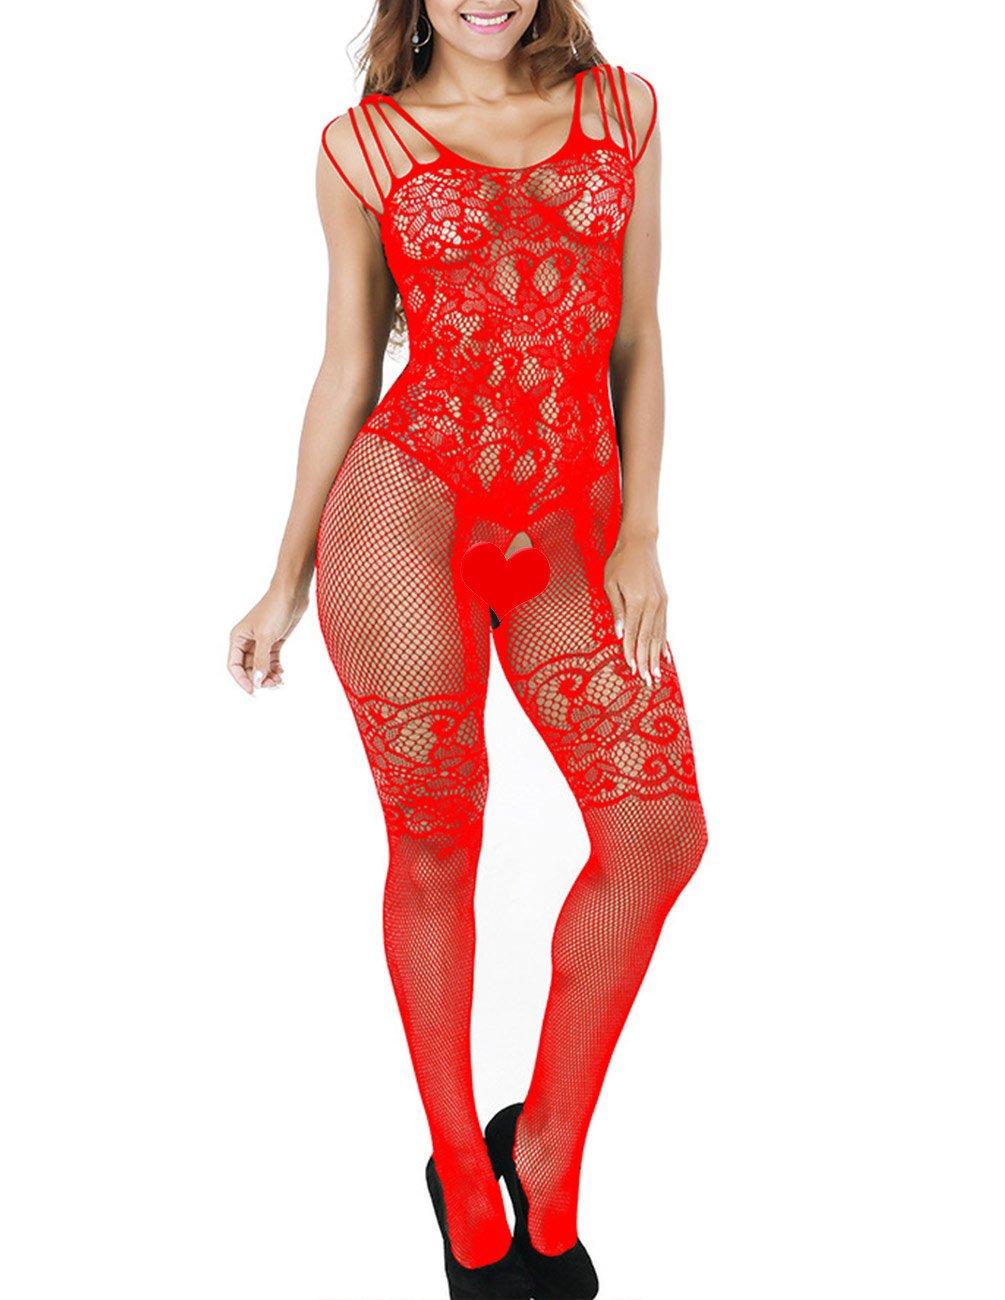 Buauty Womens Floral Lace Bodysuit Lingerie Fishnet Open Crotch Bodystocking Sexy Lingerie